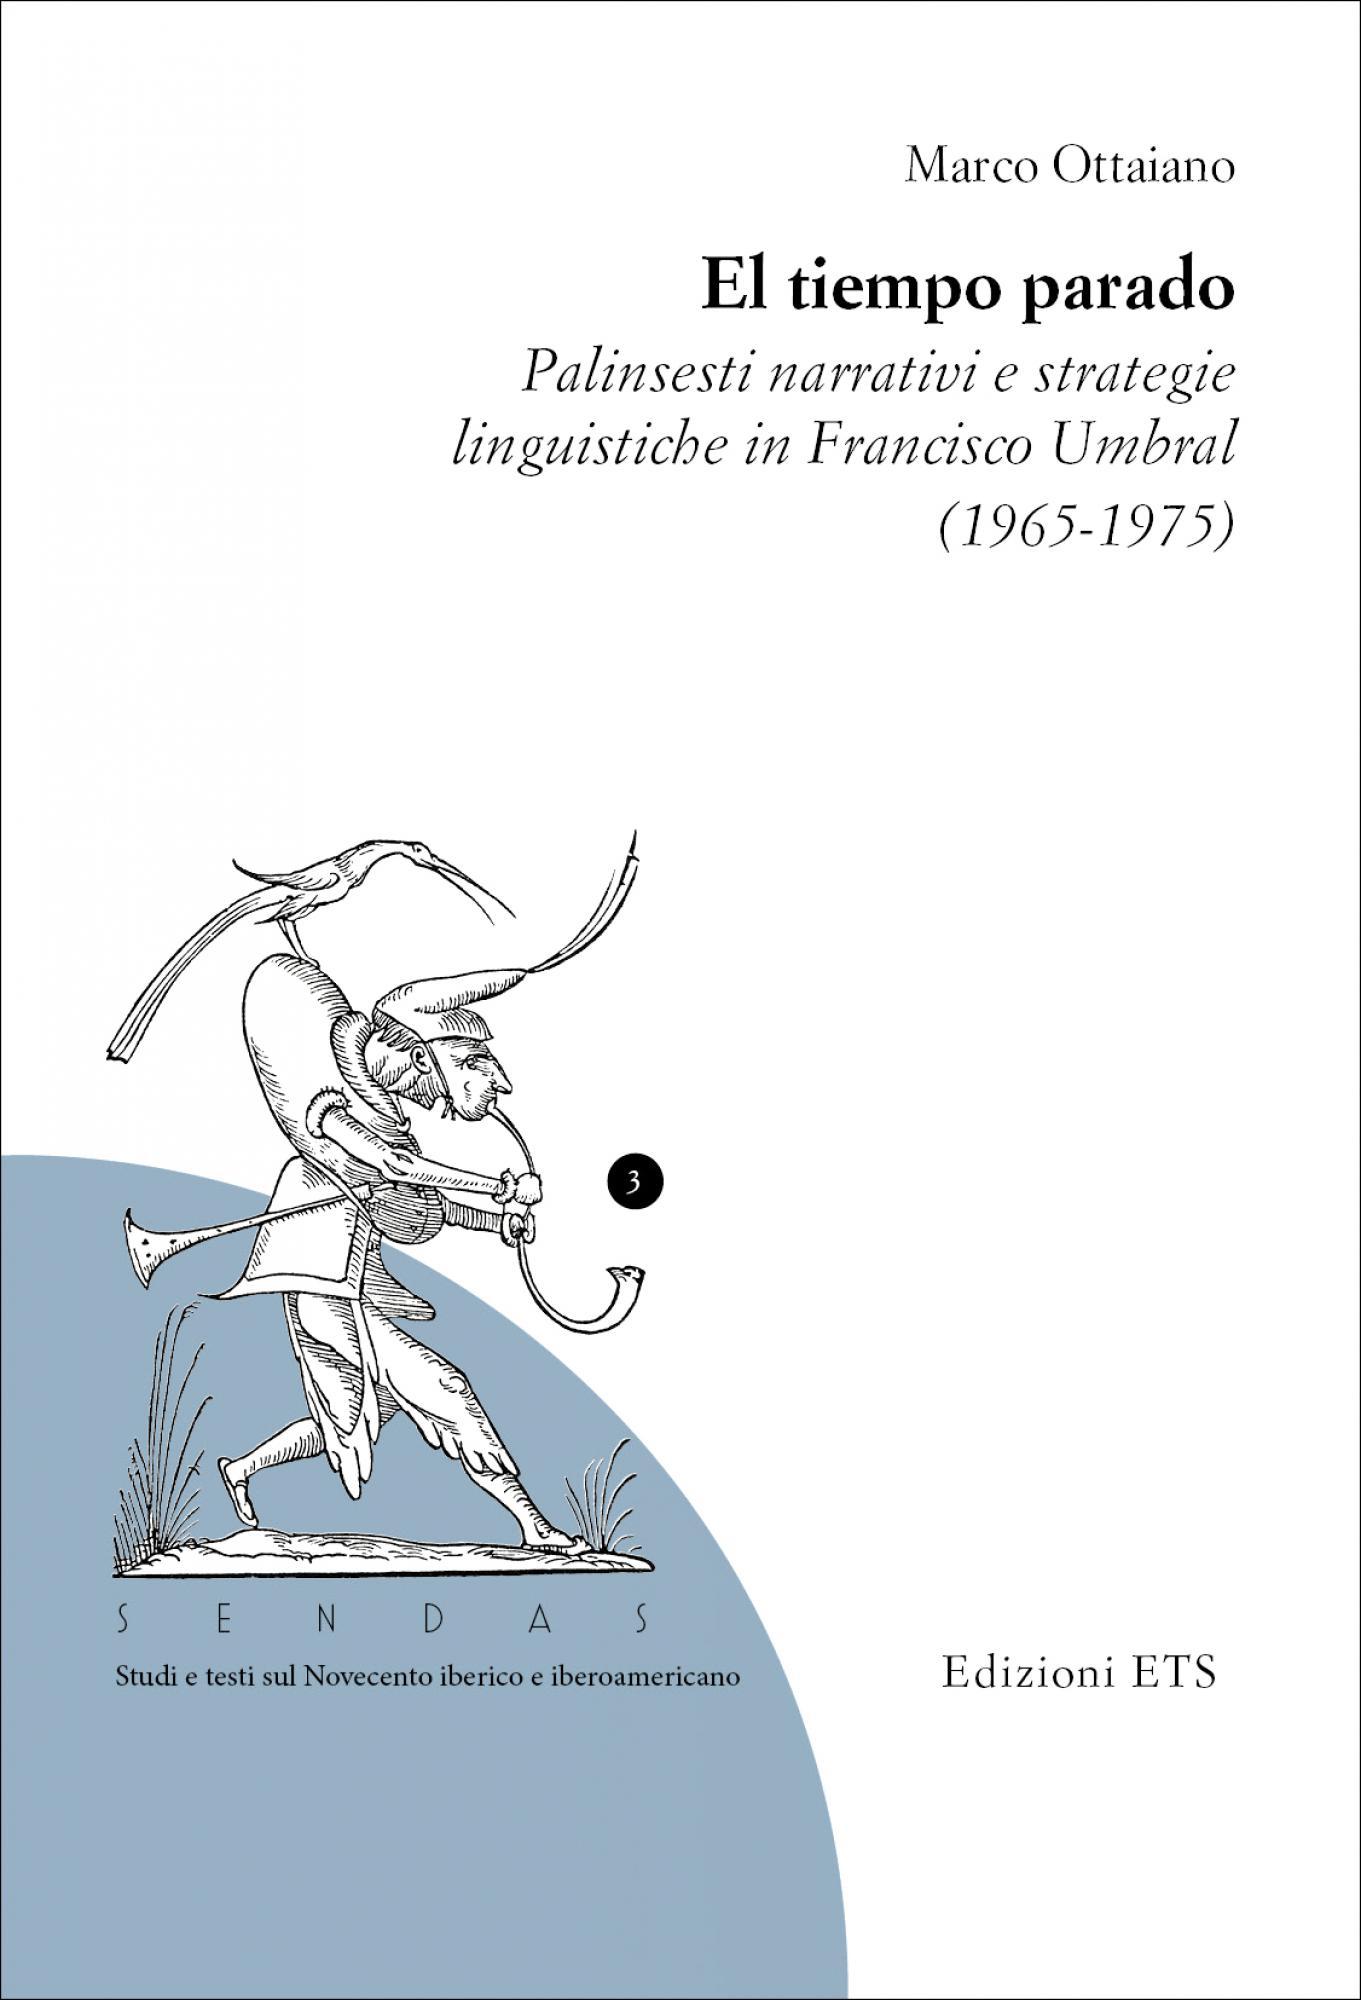 El tiempo parado.Palinsesti narrativi e strategie linguistiche in Francisco Umbral (1965-1975)